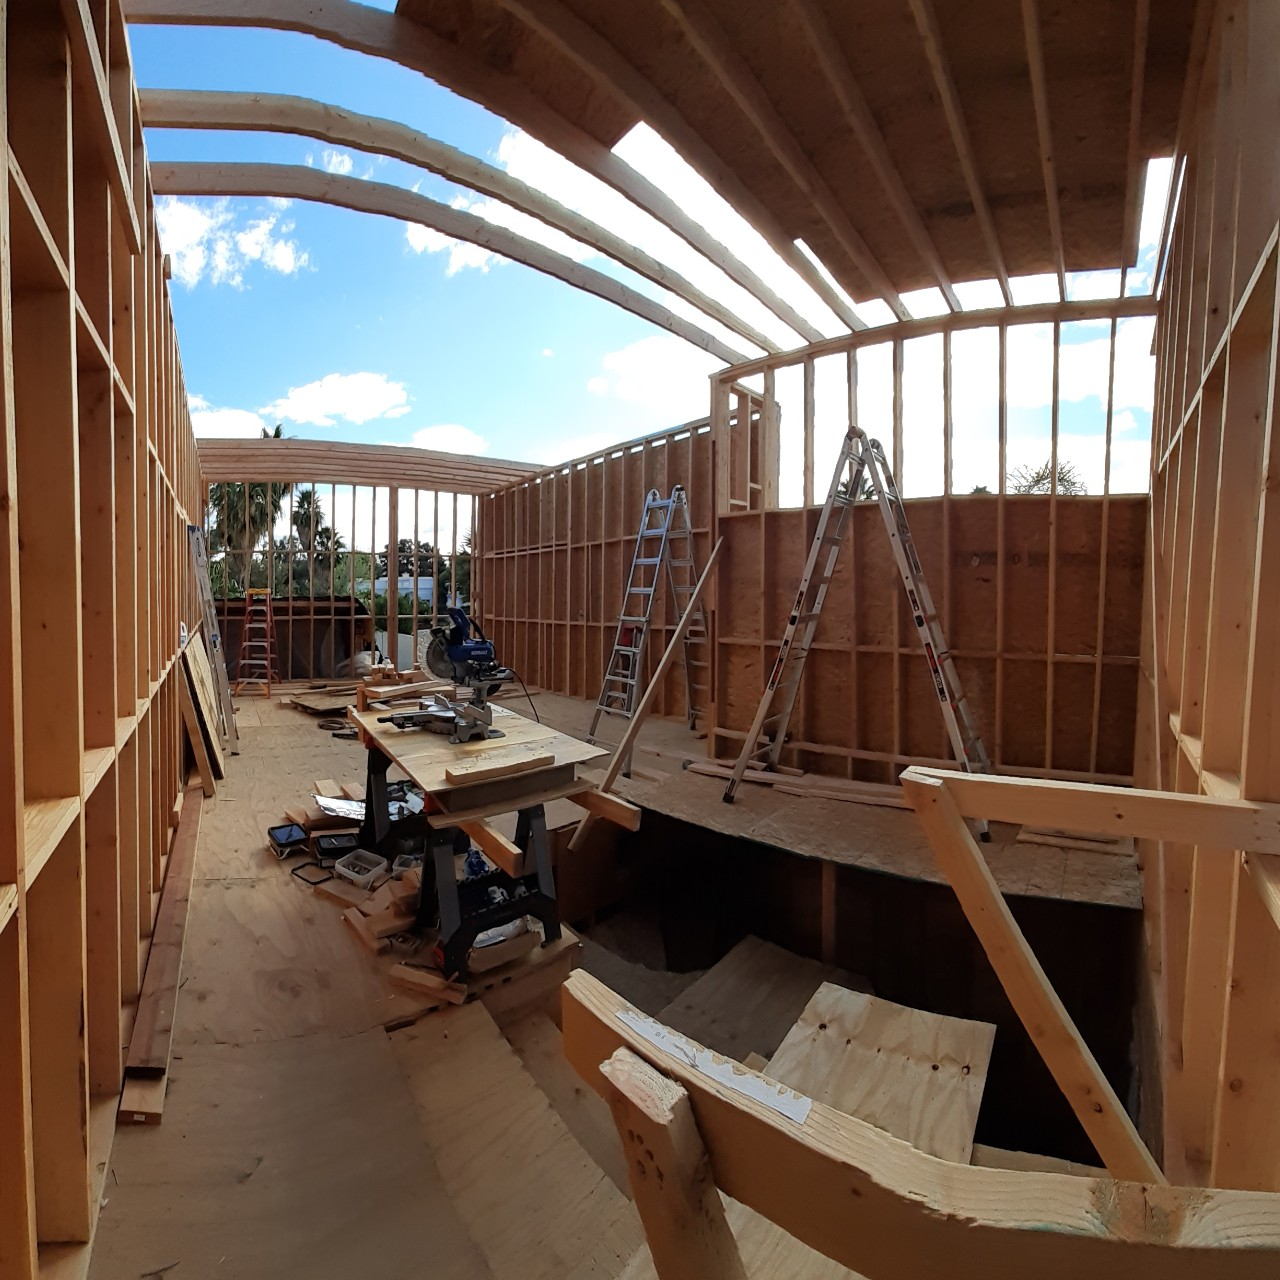 carpentry-wood-framing-second-floor-home-addition--framing-106